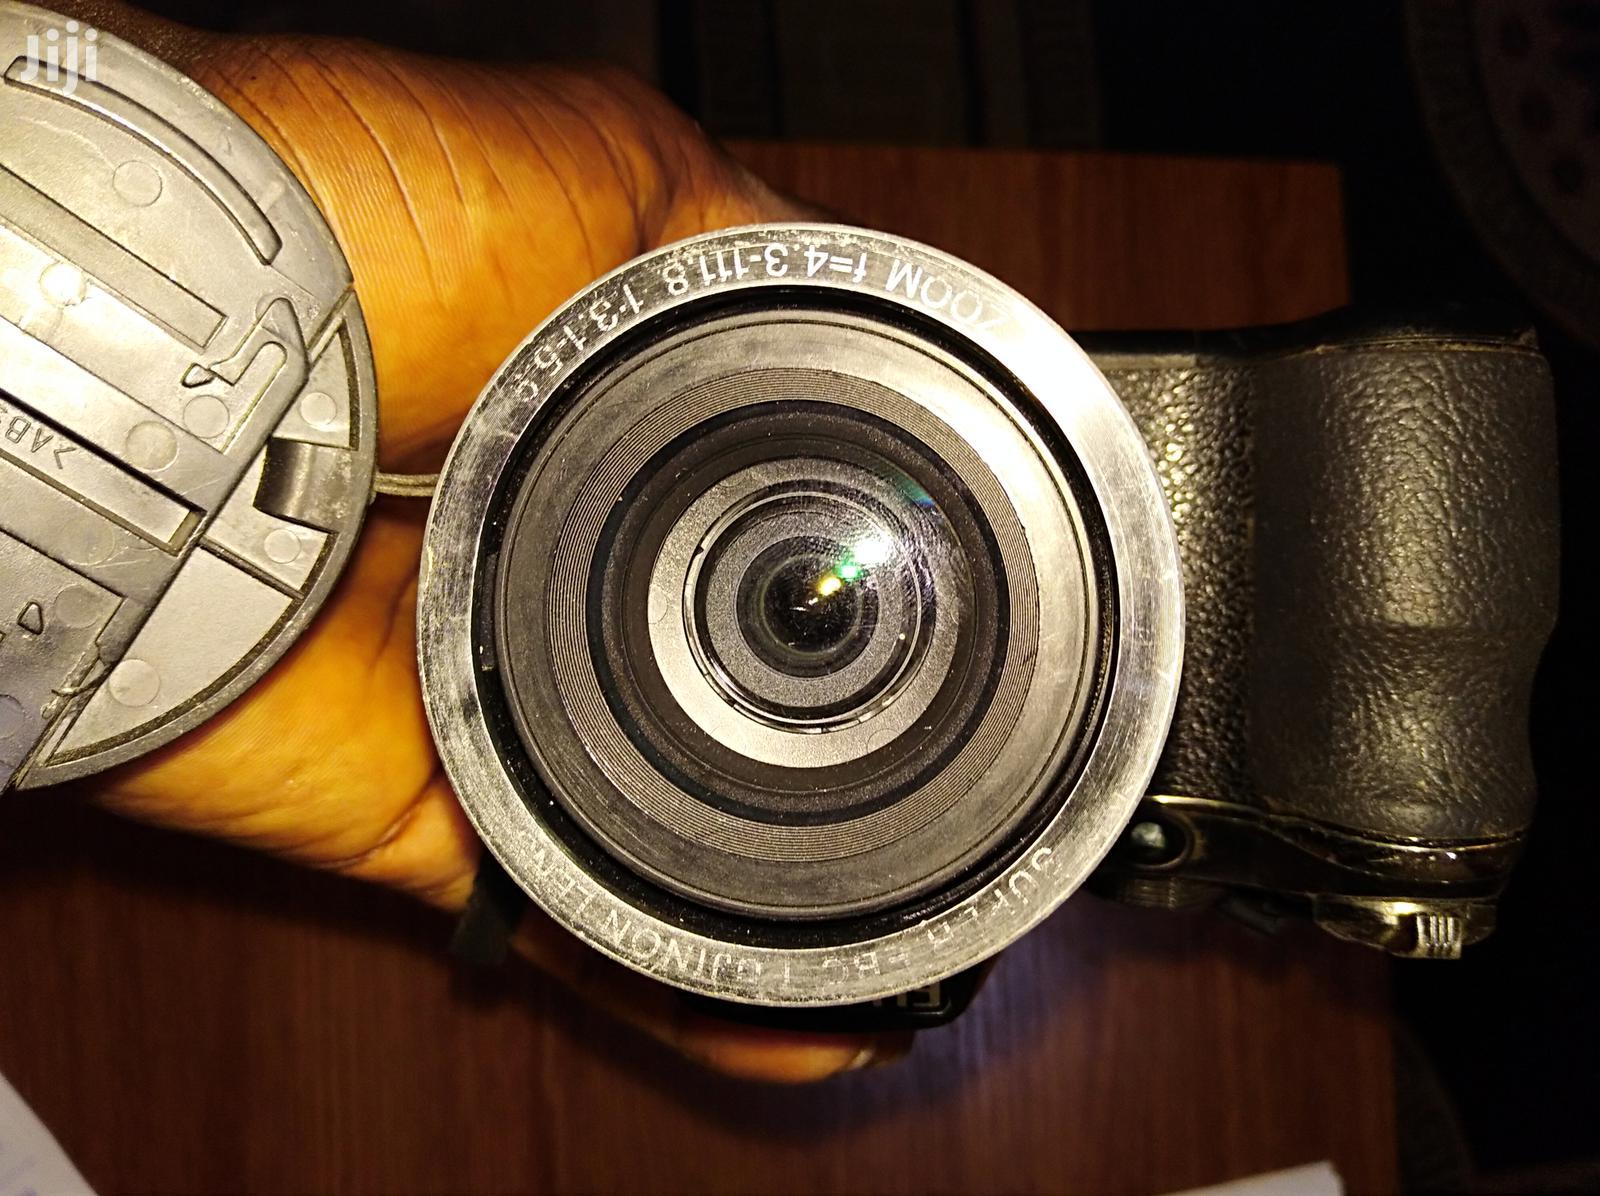 Archive: Slightly Used Fujifilm Finepix S4300 Digital Camera From the U.S.A